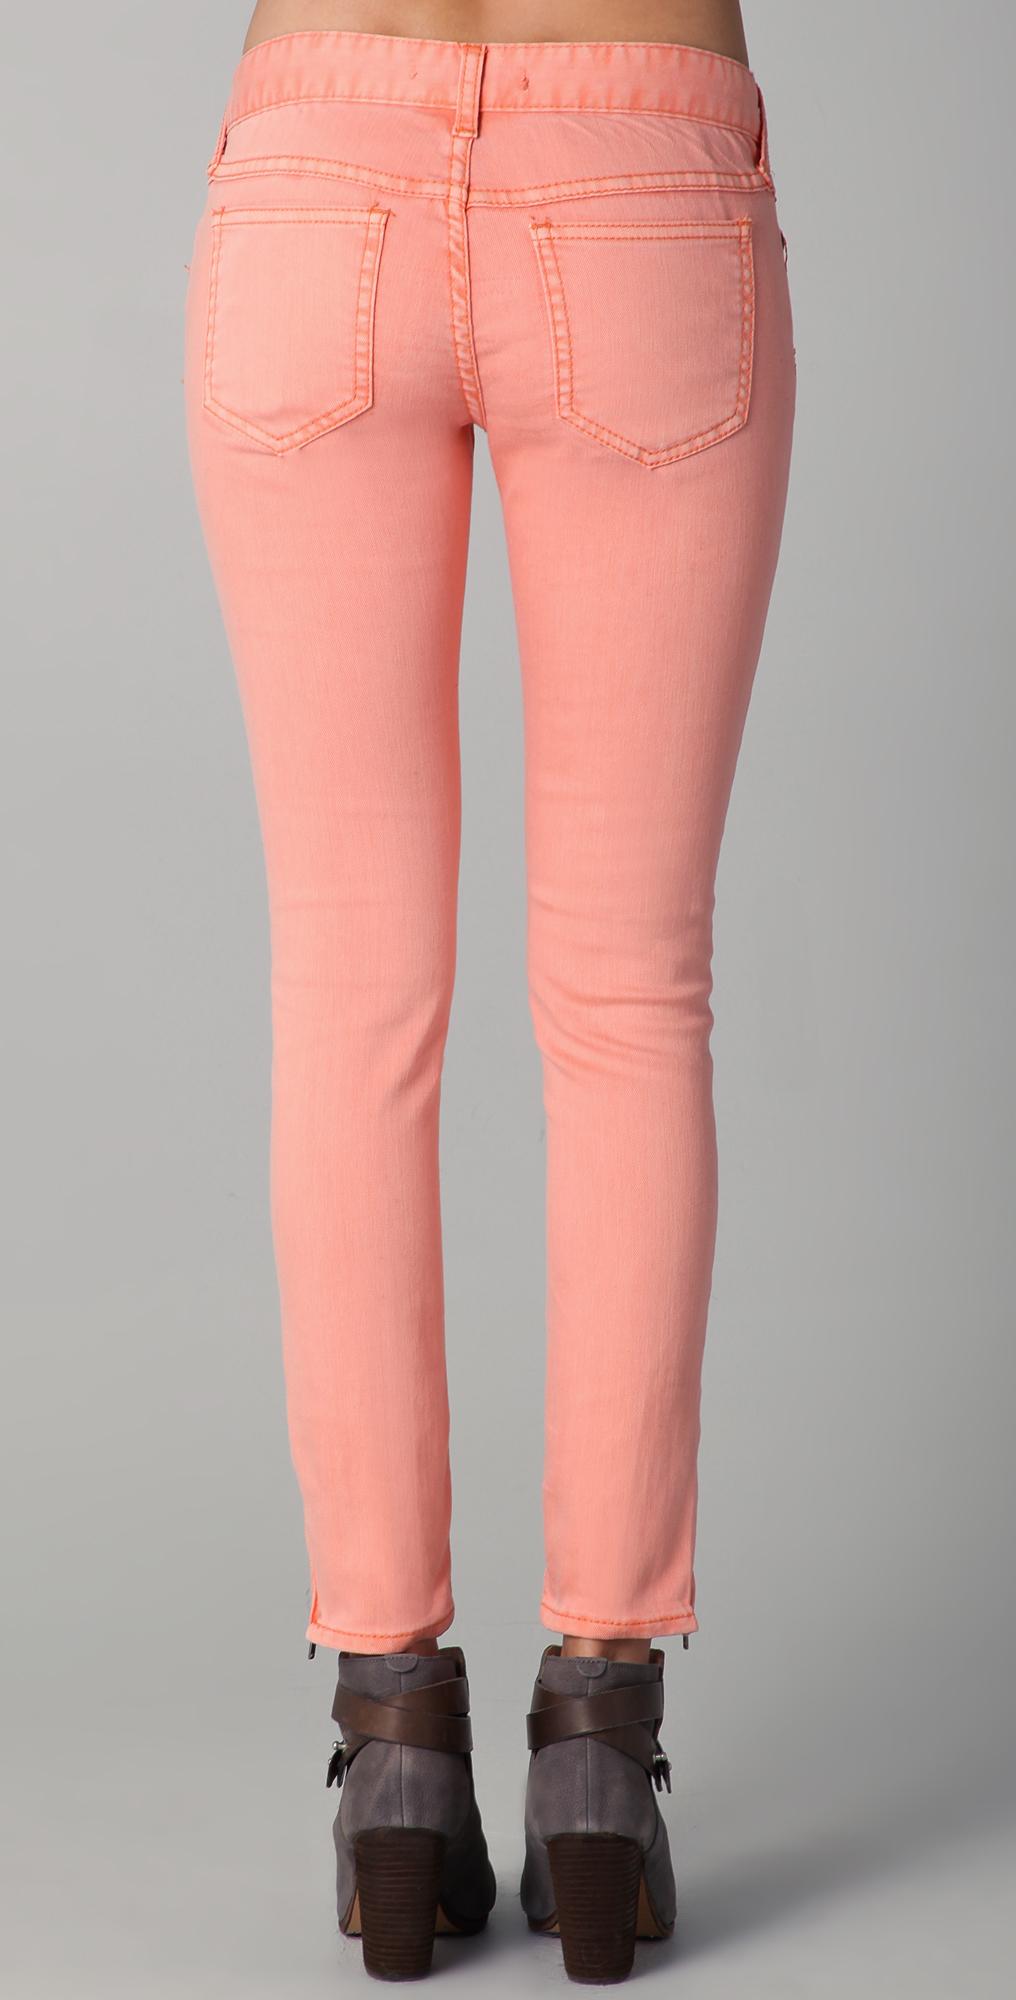 Celebrity Pink Jeans, Low Rise Skinny Women's Black Jeans ...